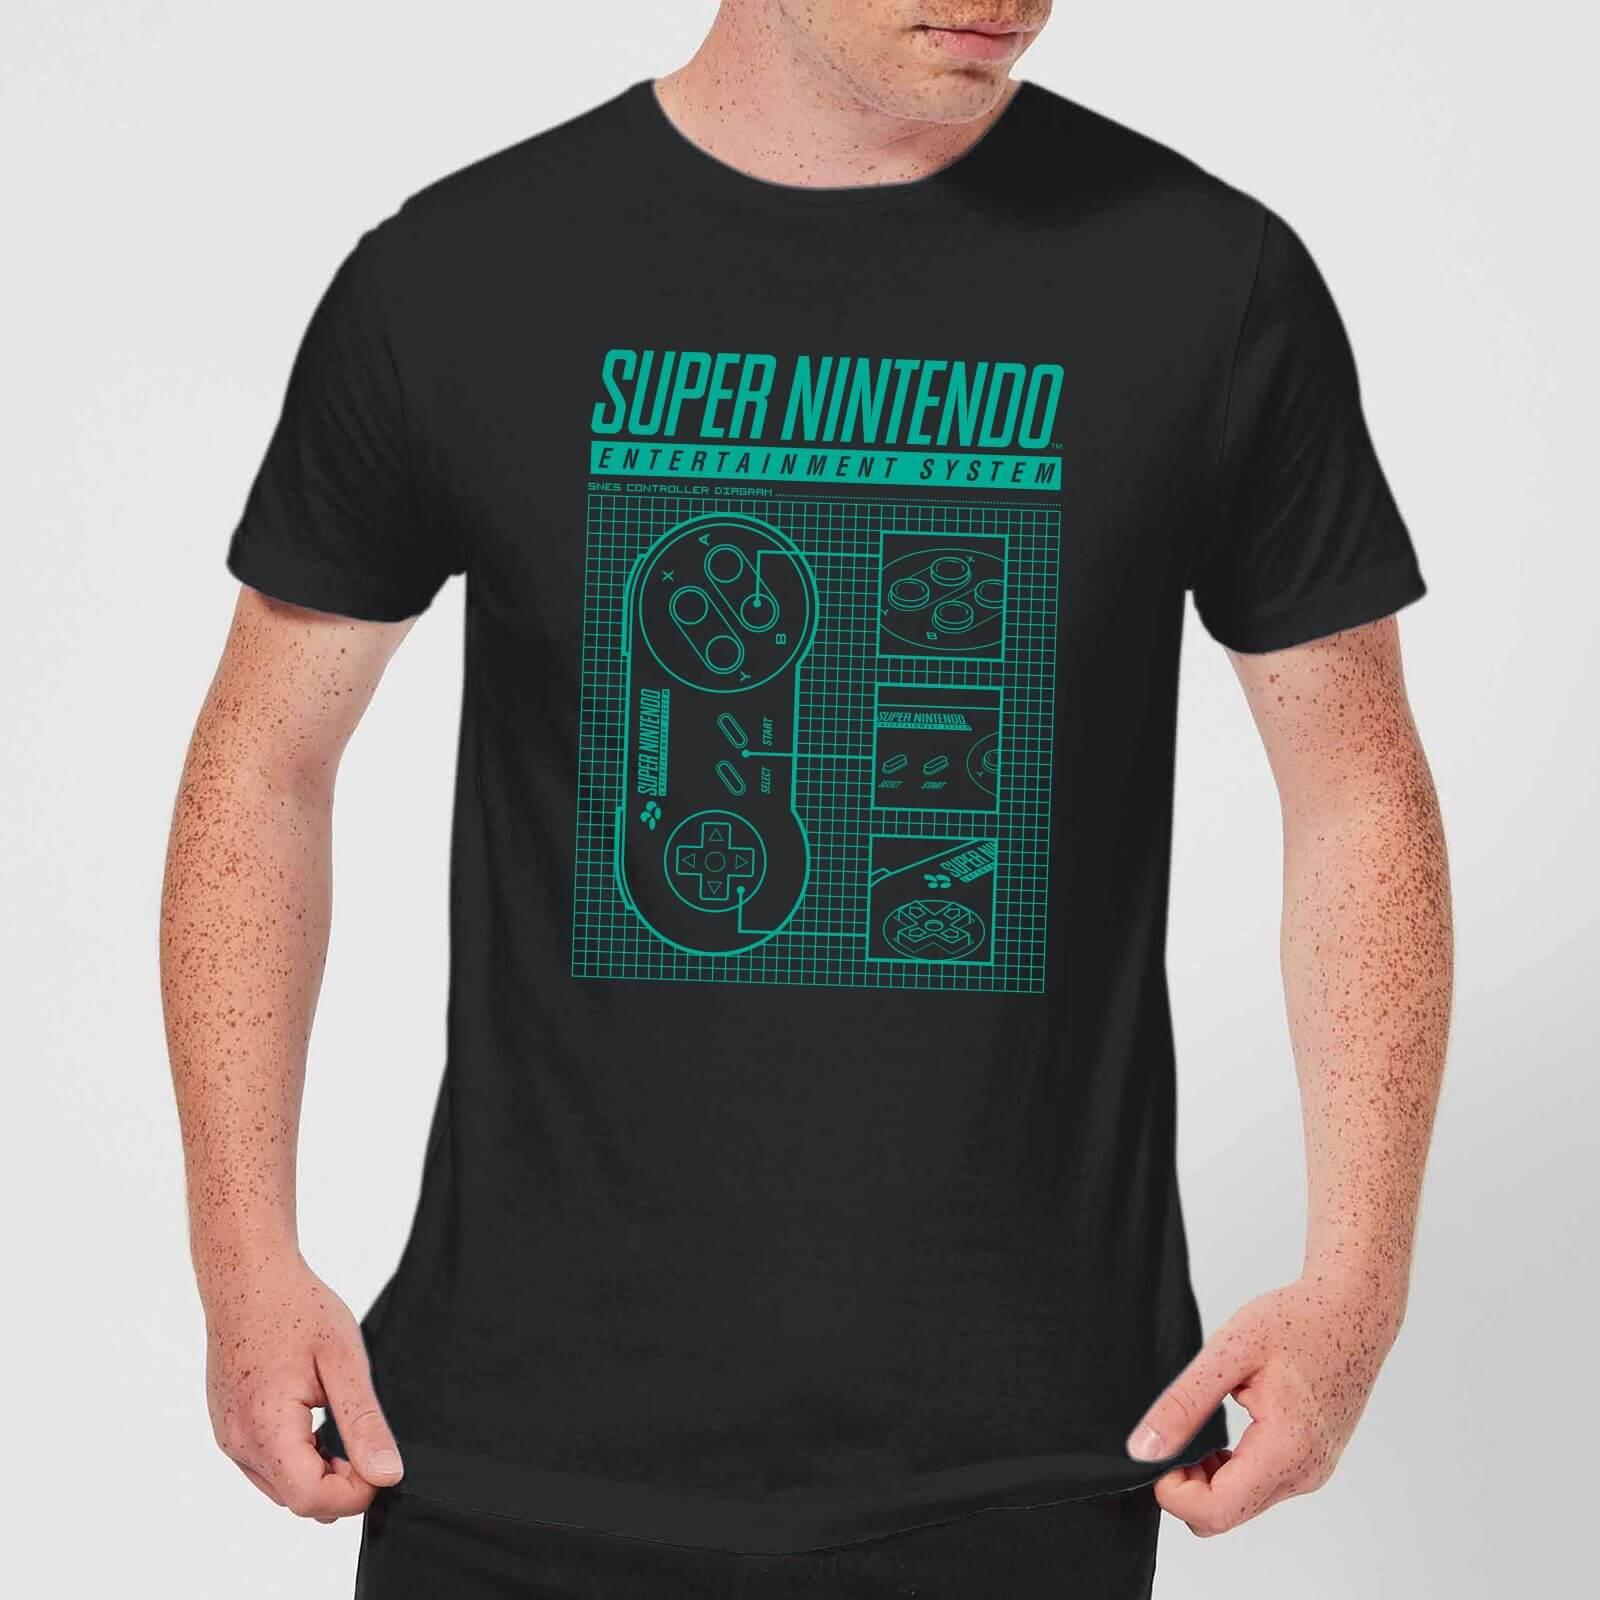 7350f16c4c407c Super Nintendo Entertainment System Schwarzes T-Shirt